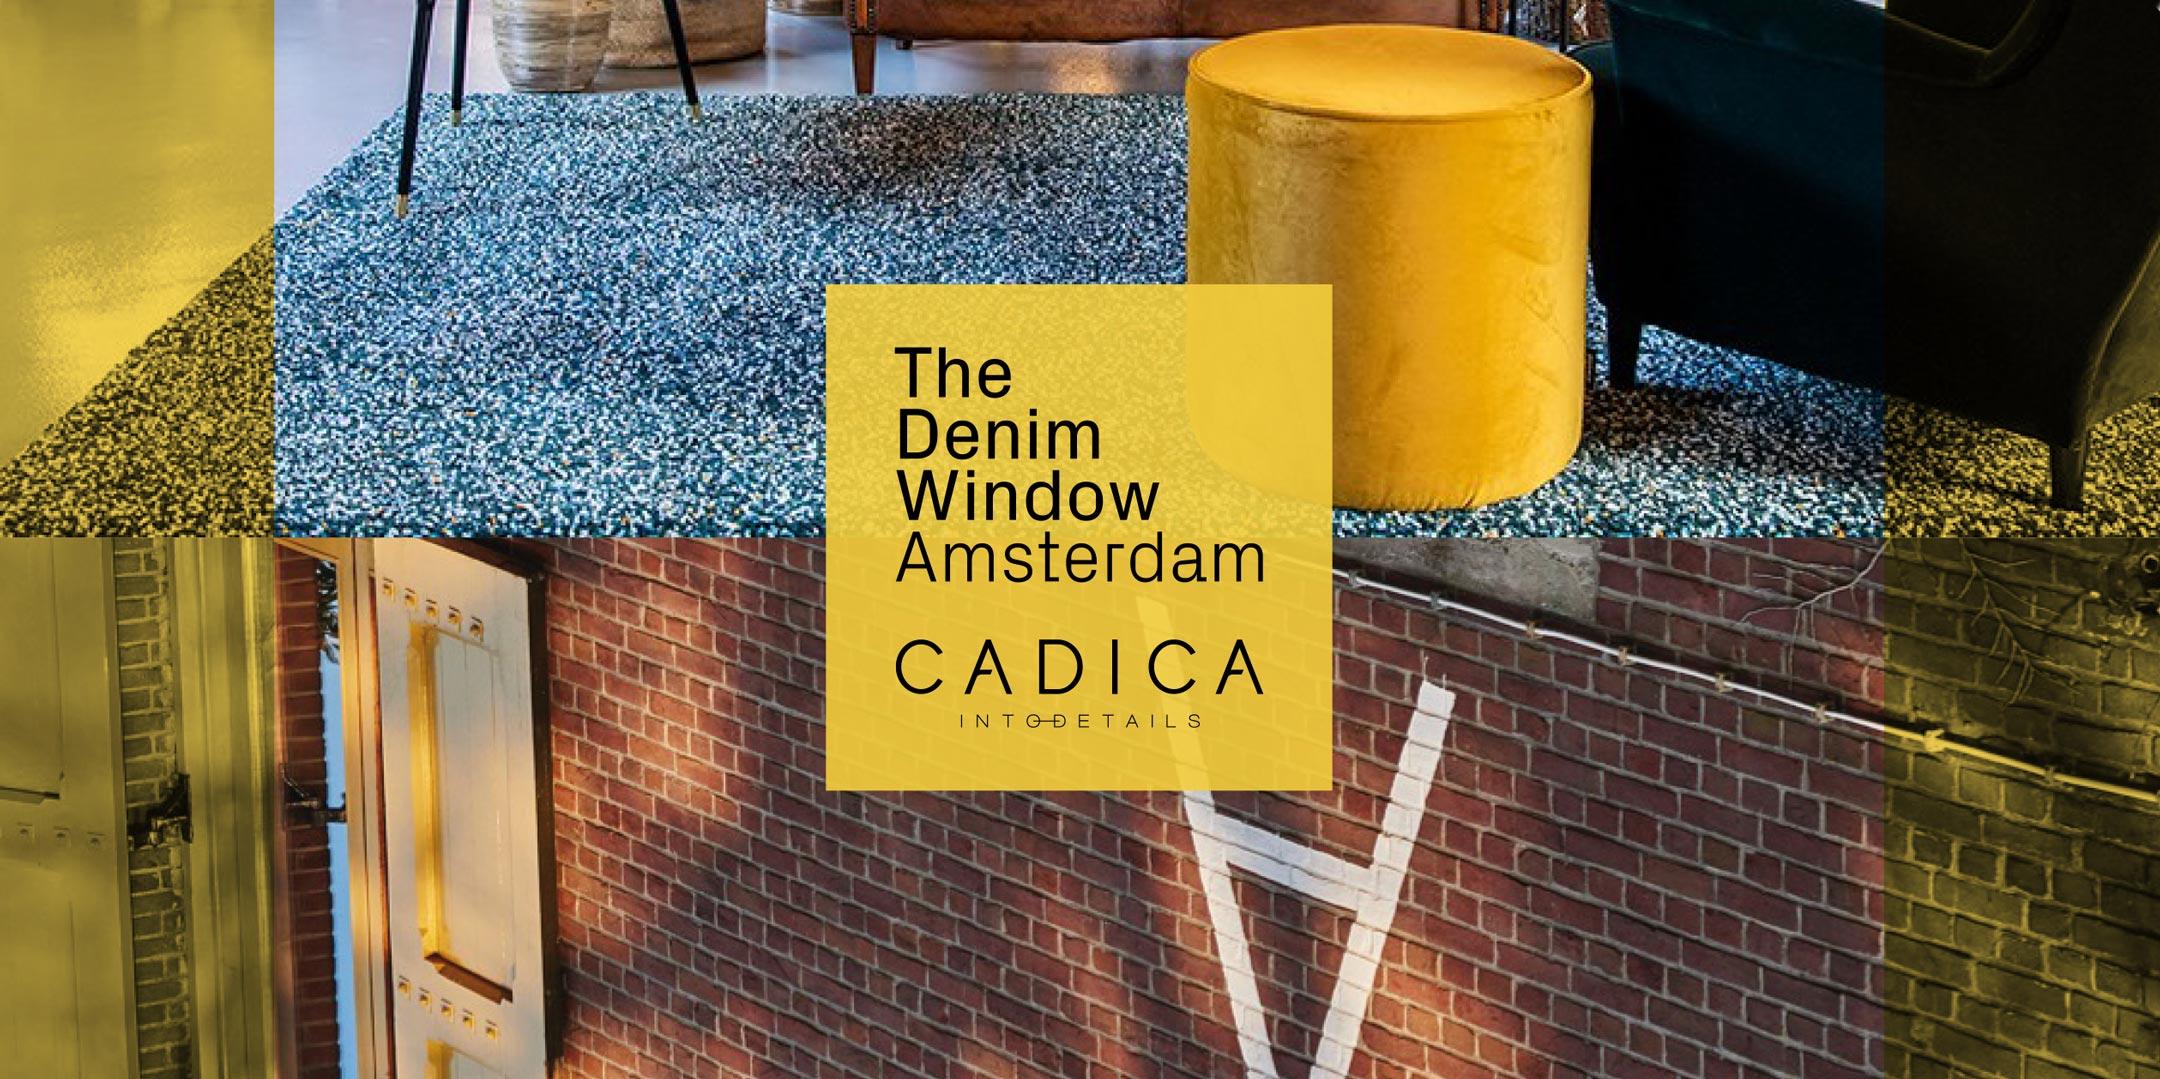 The Denim Window